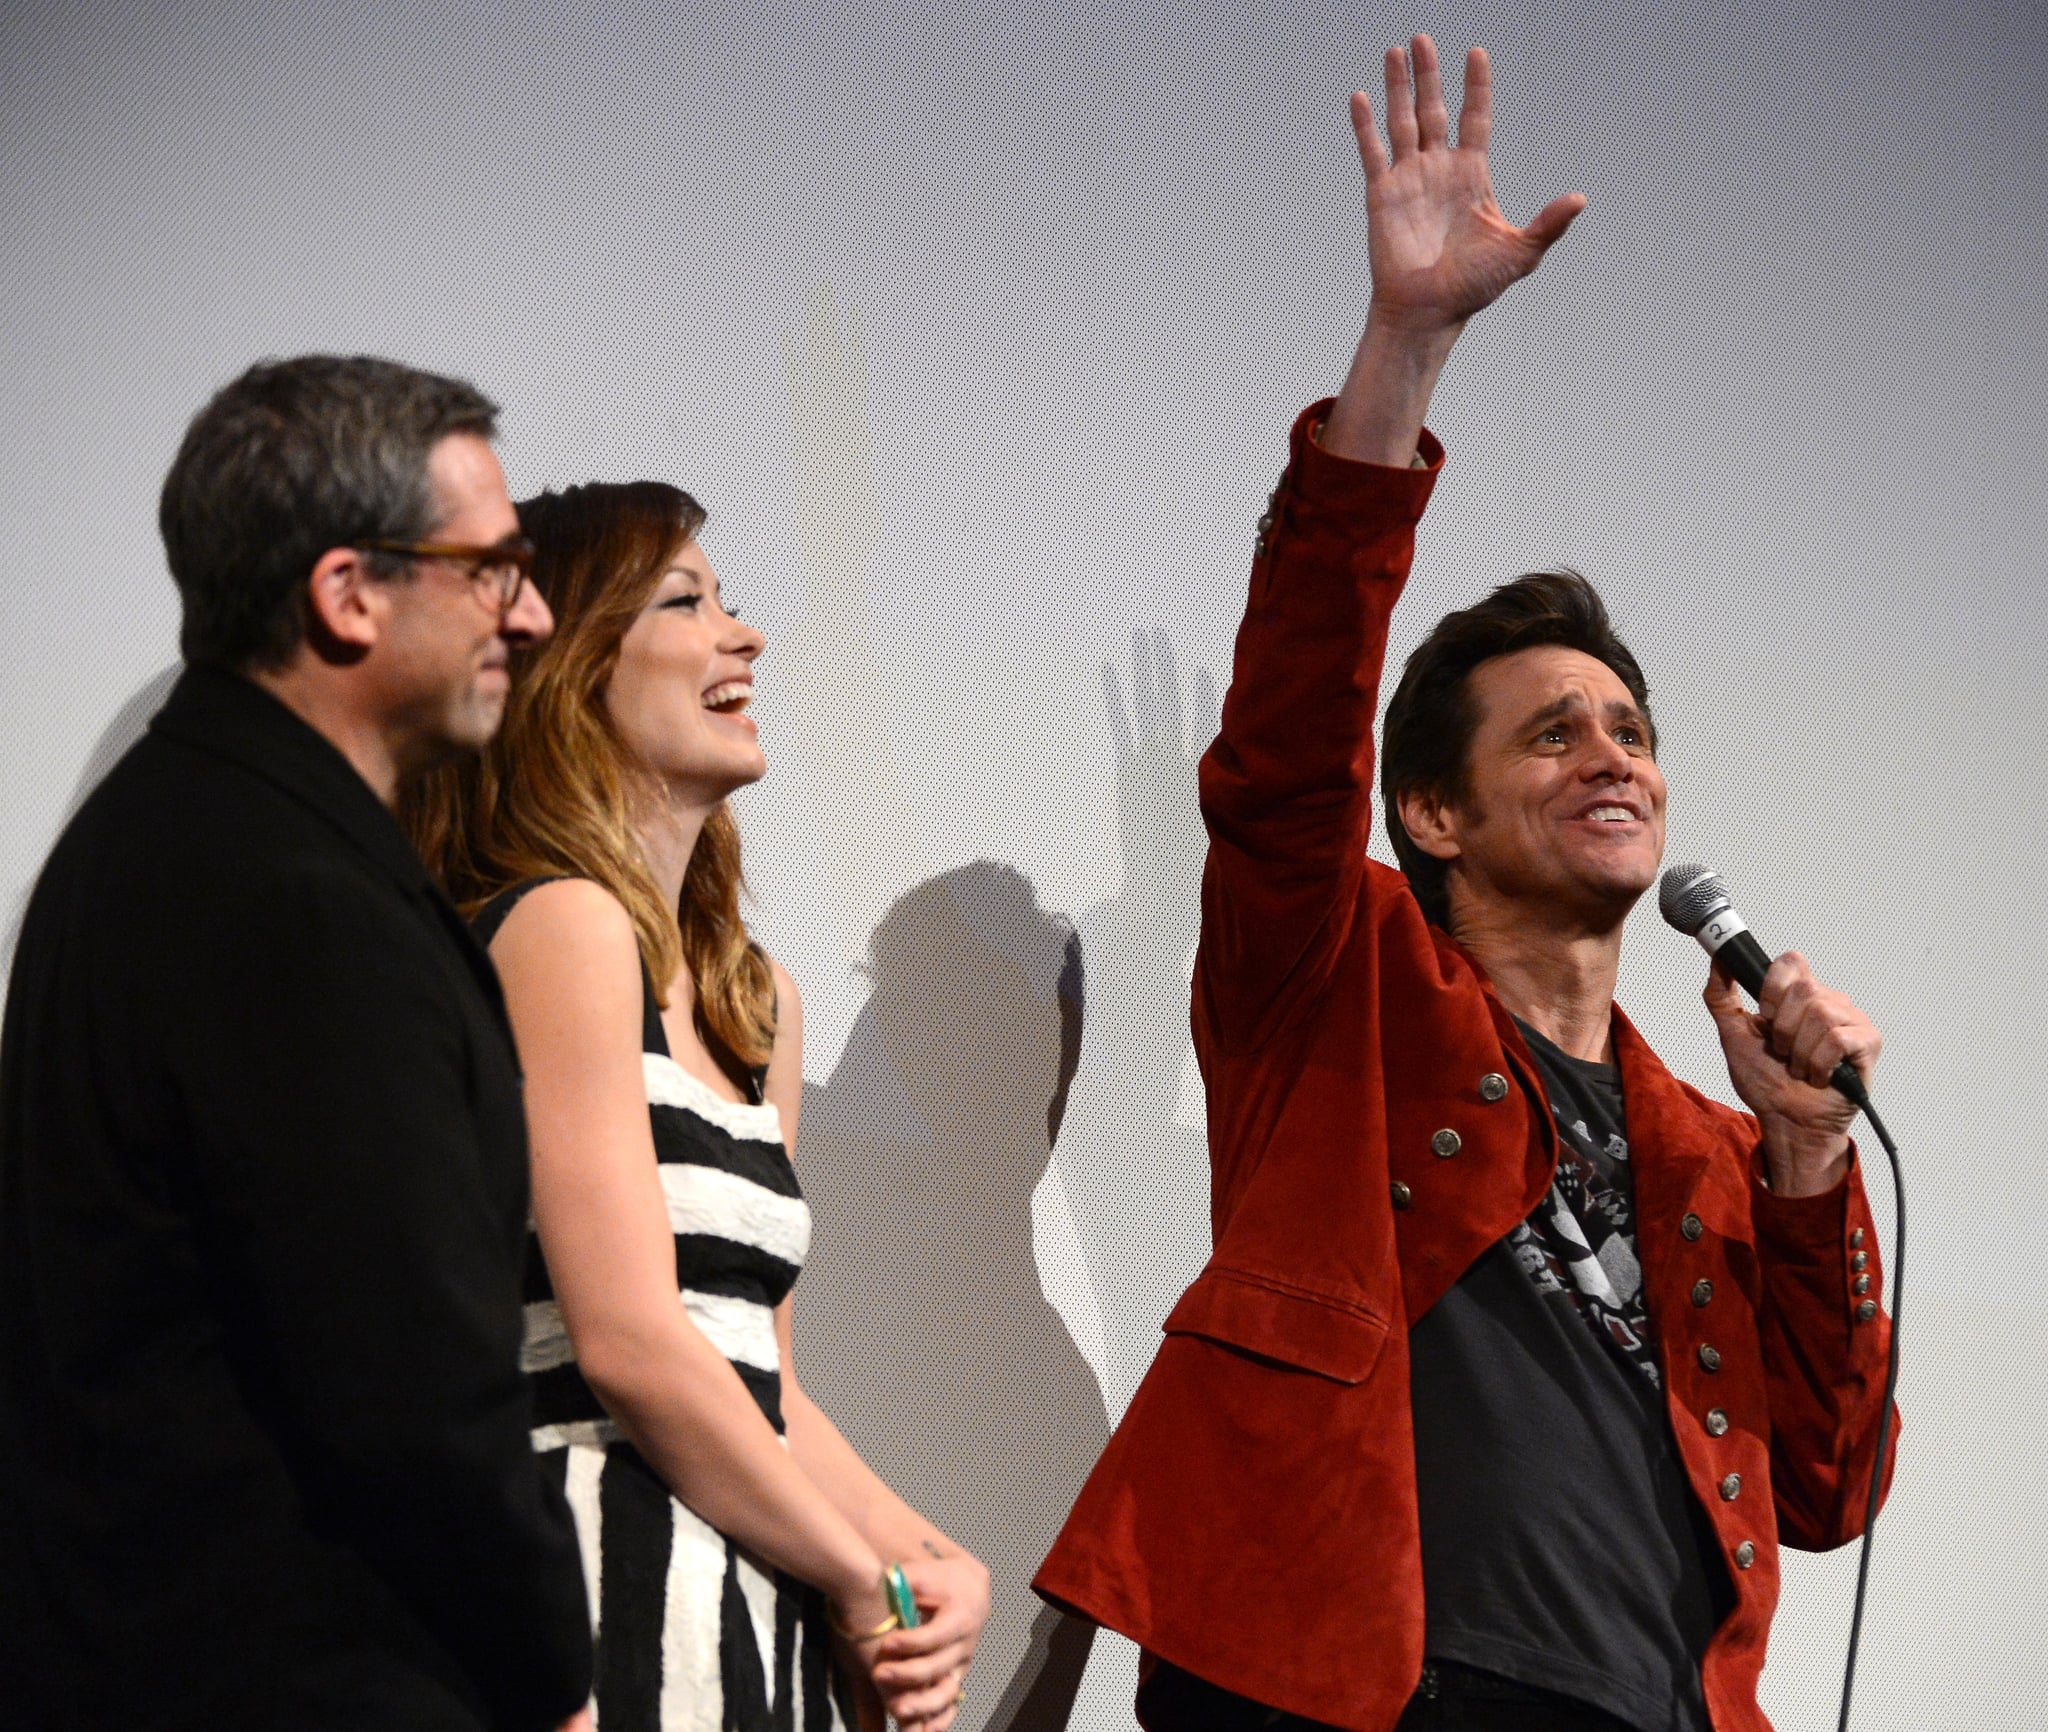 Olivia Wilde Celebrates Burt Wonderstone With Steve Carell and Jim Carrey at SXSW